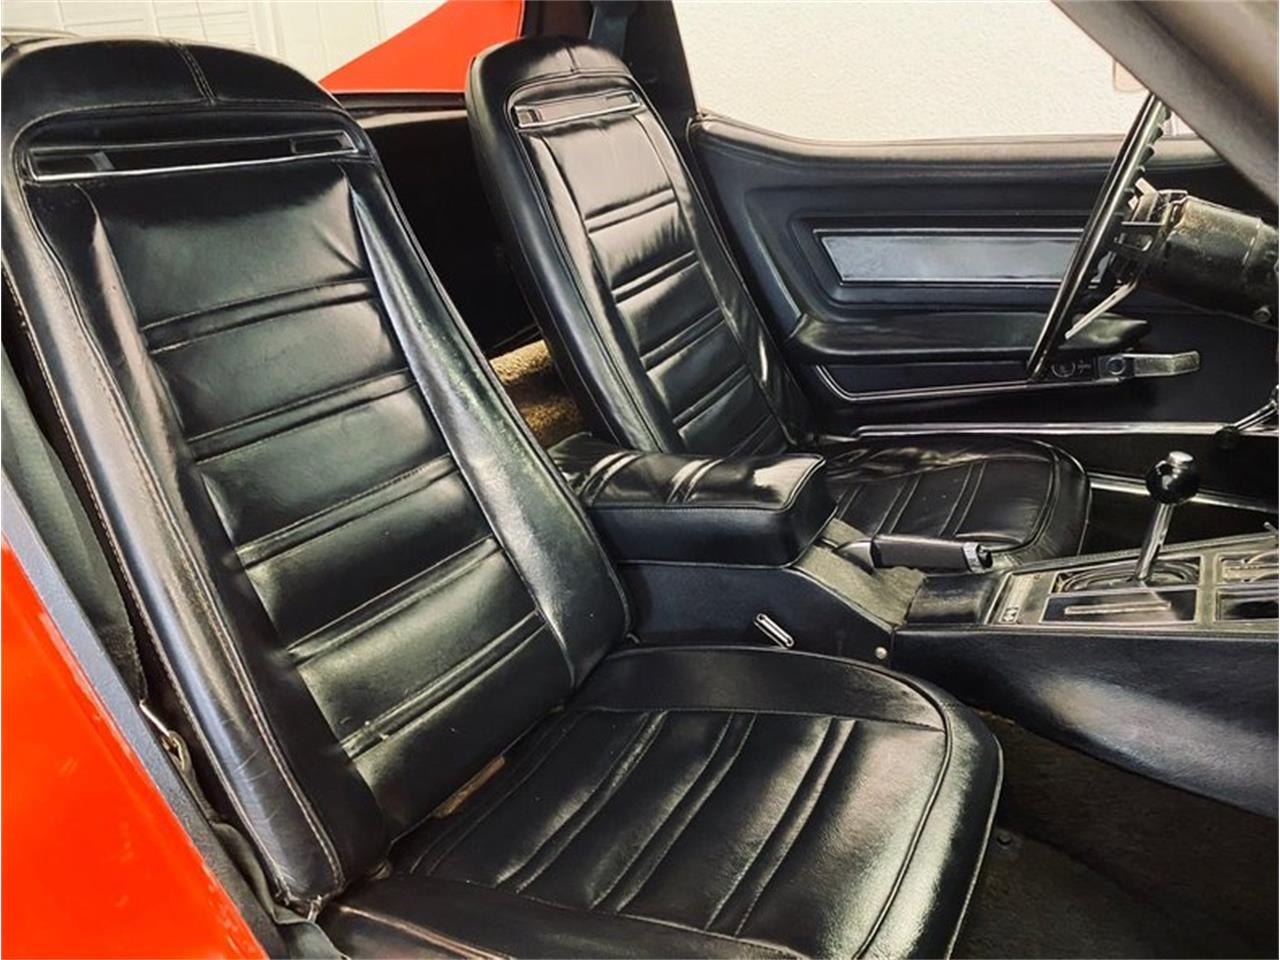 1974 Chevrolet Corvette (CC-1420886) for sale in Largo, Florida